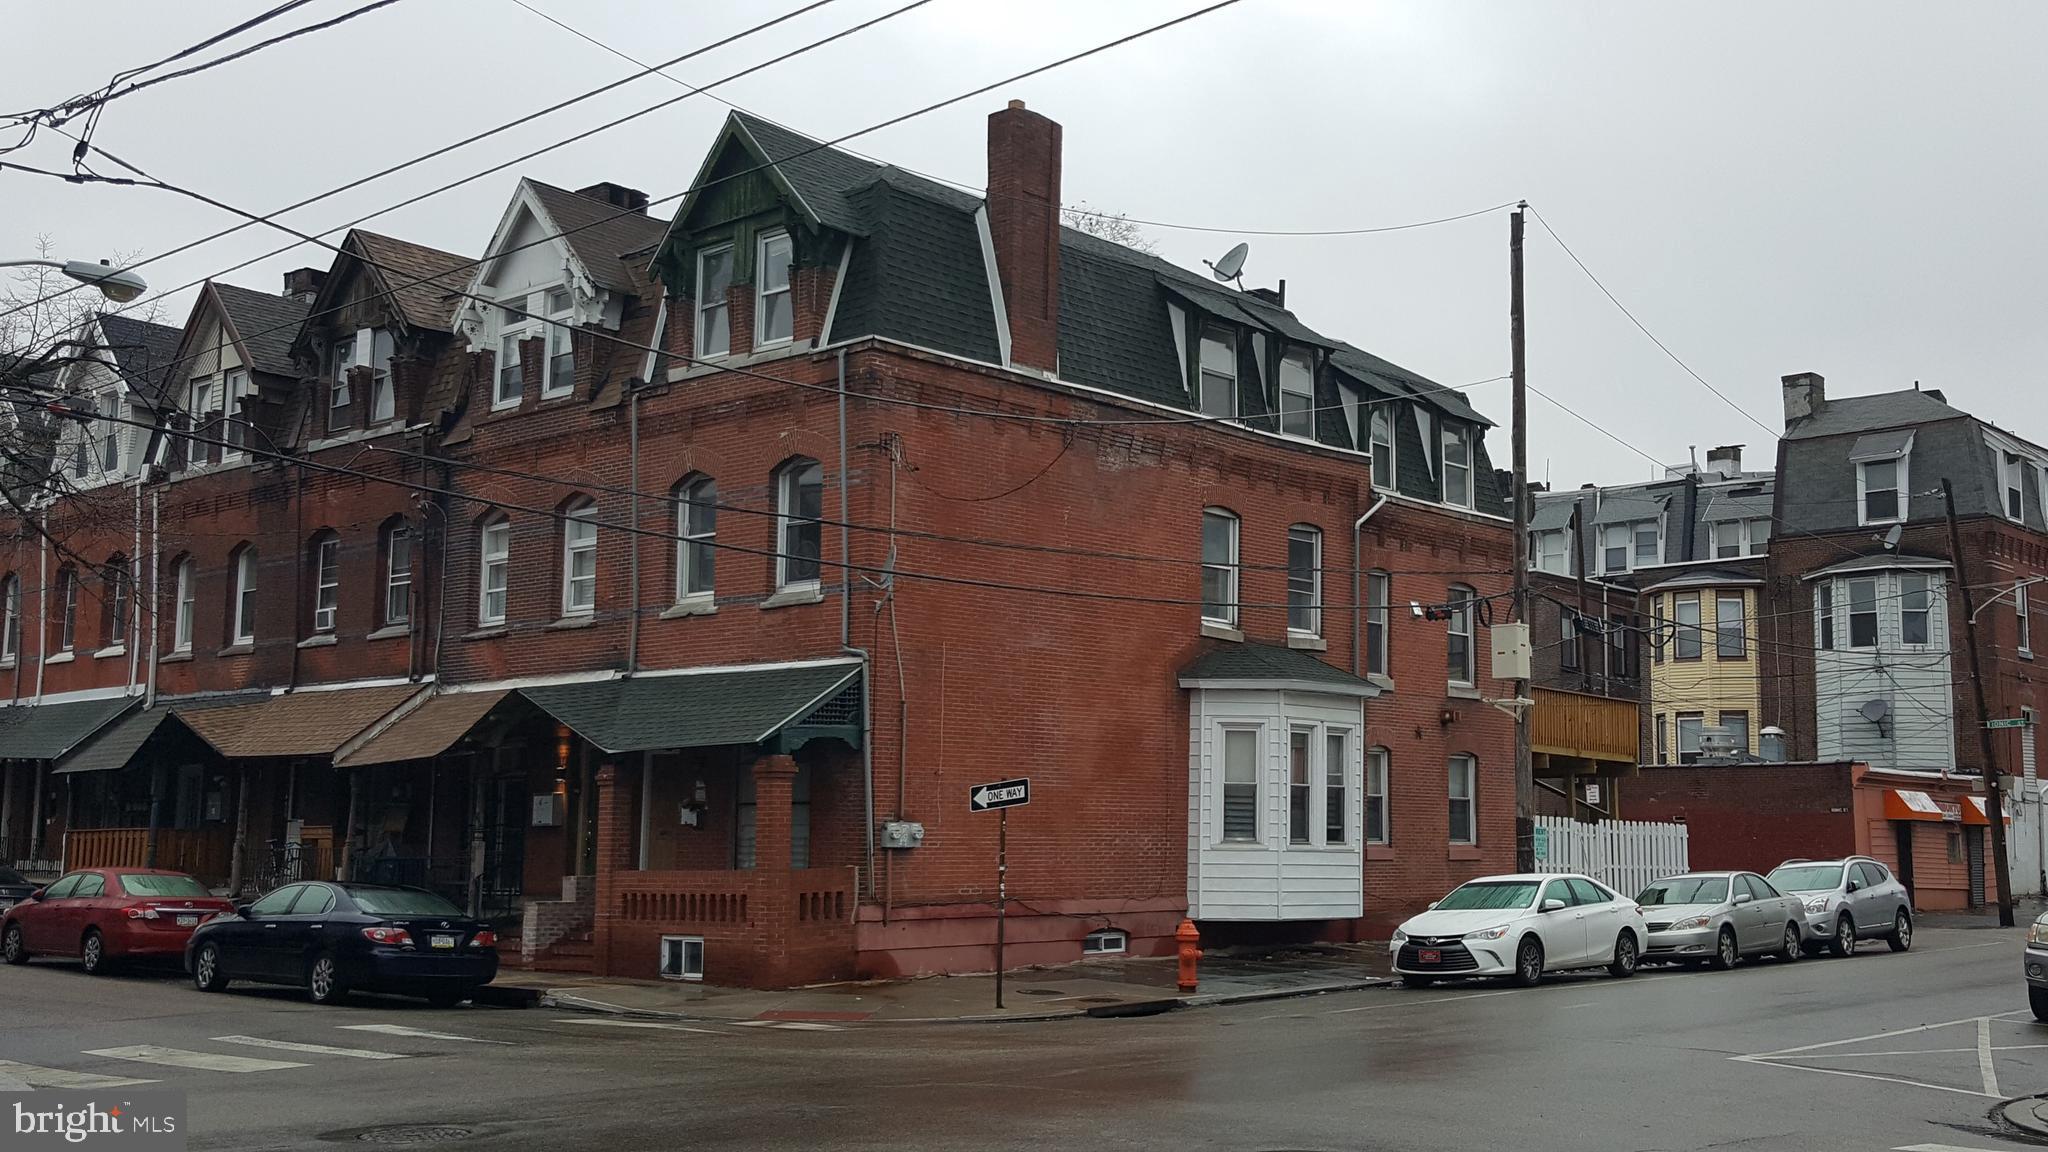 4401 SANSOM STREET, PHILADELPHIA, PA 19104